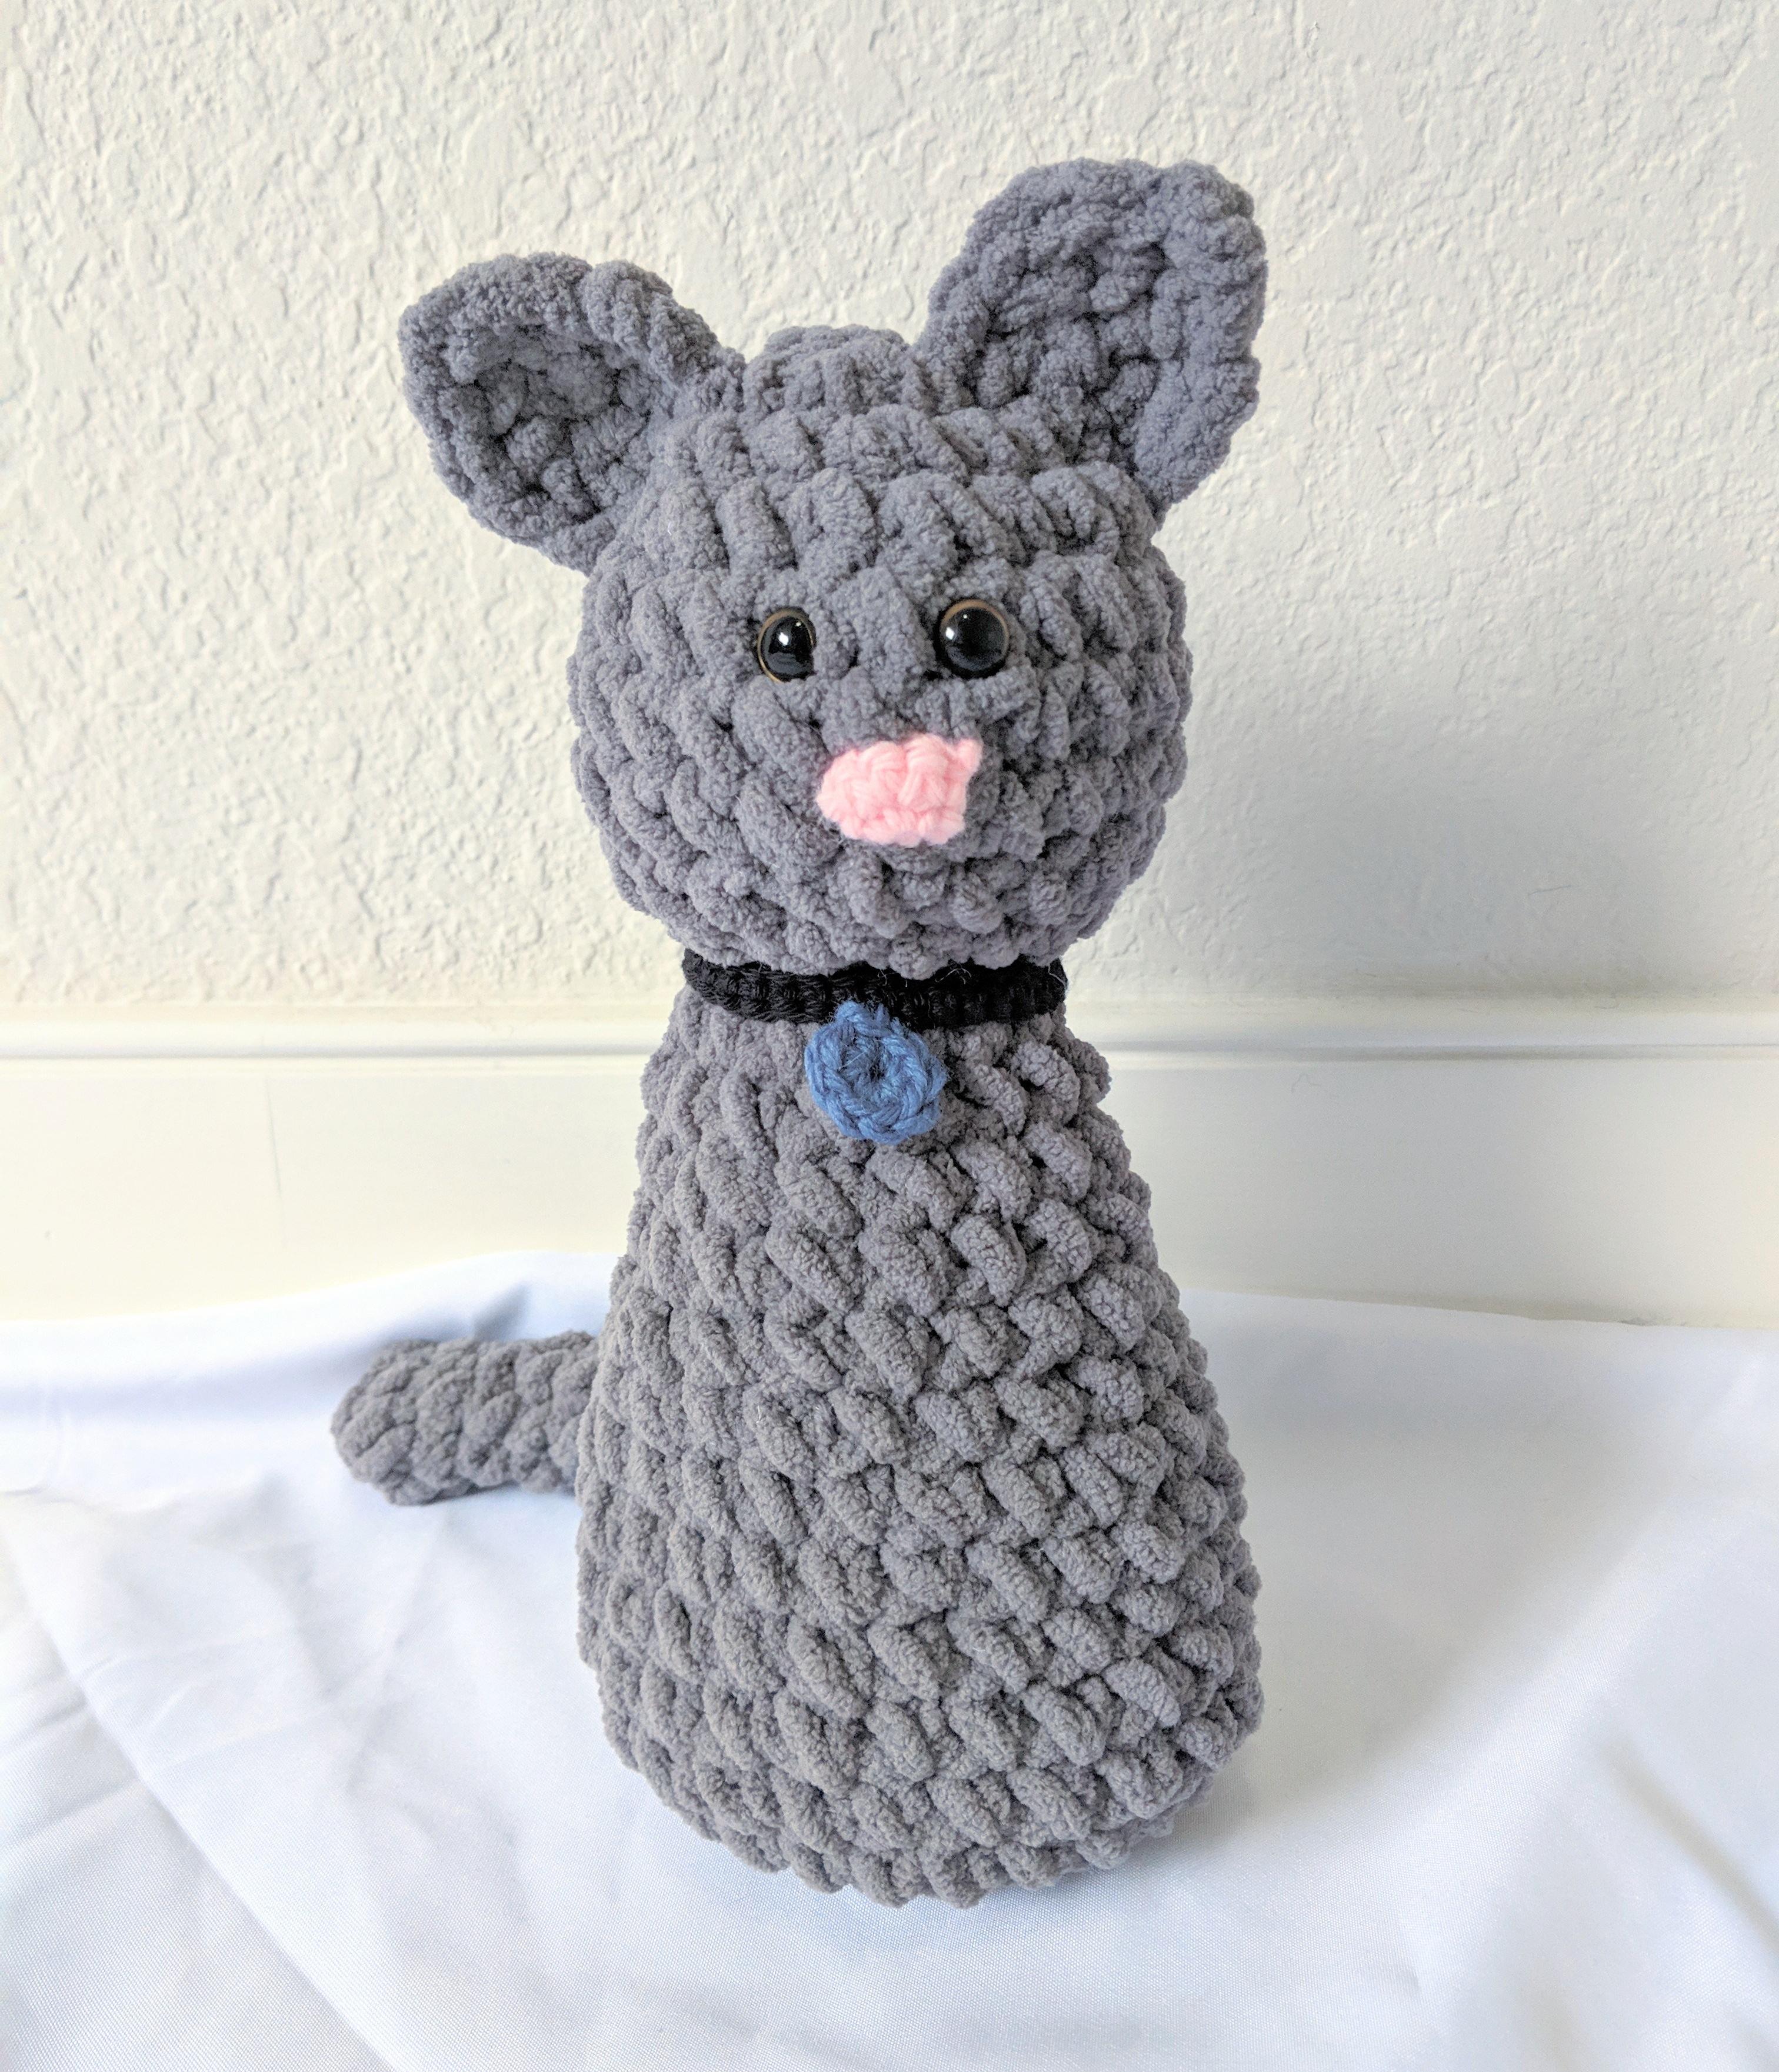 Ballerina cat doll crochet pattern | Crochet collar pattern ... | 3522x3024